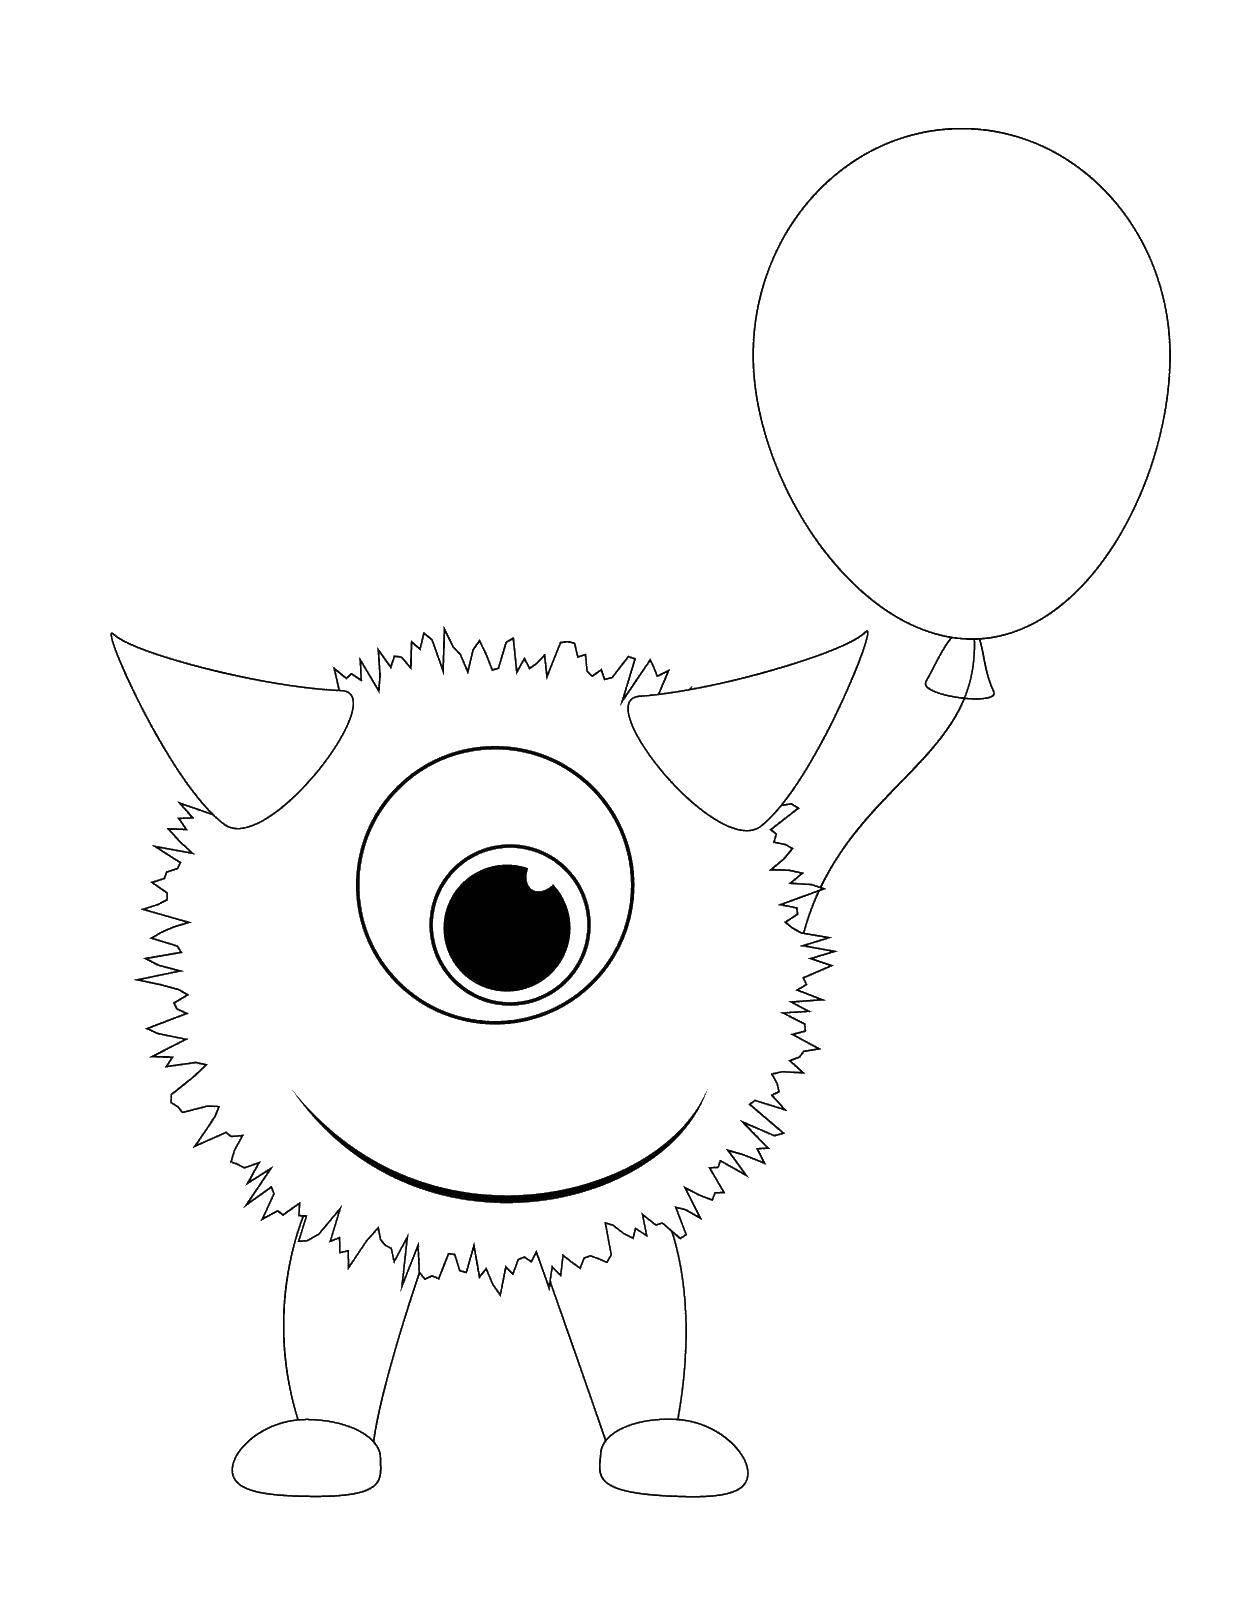 Раскраска Монстер с шариком Скачать монстер, шарики.  Распечатать ,Монстры,